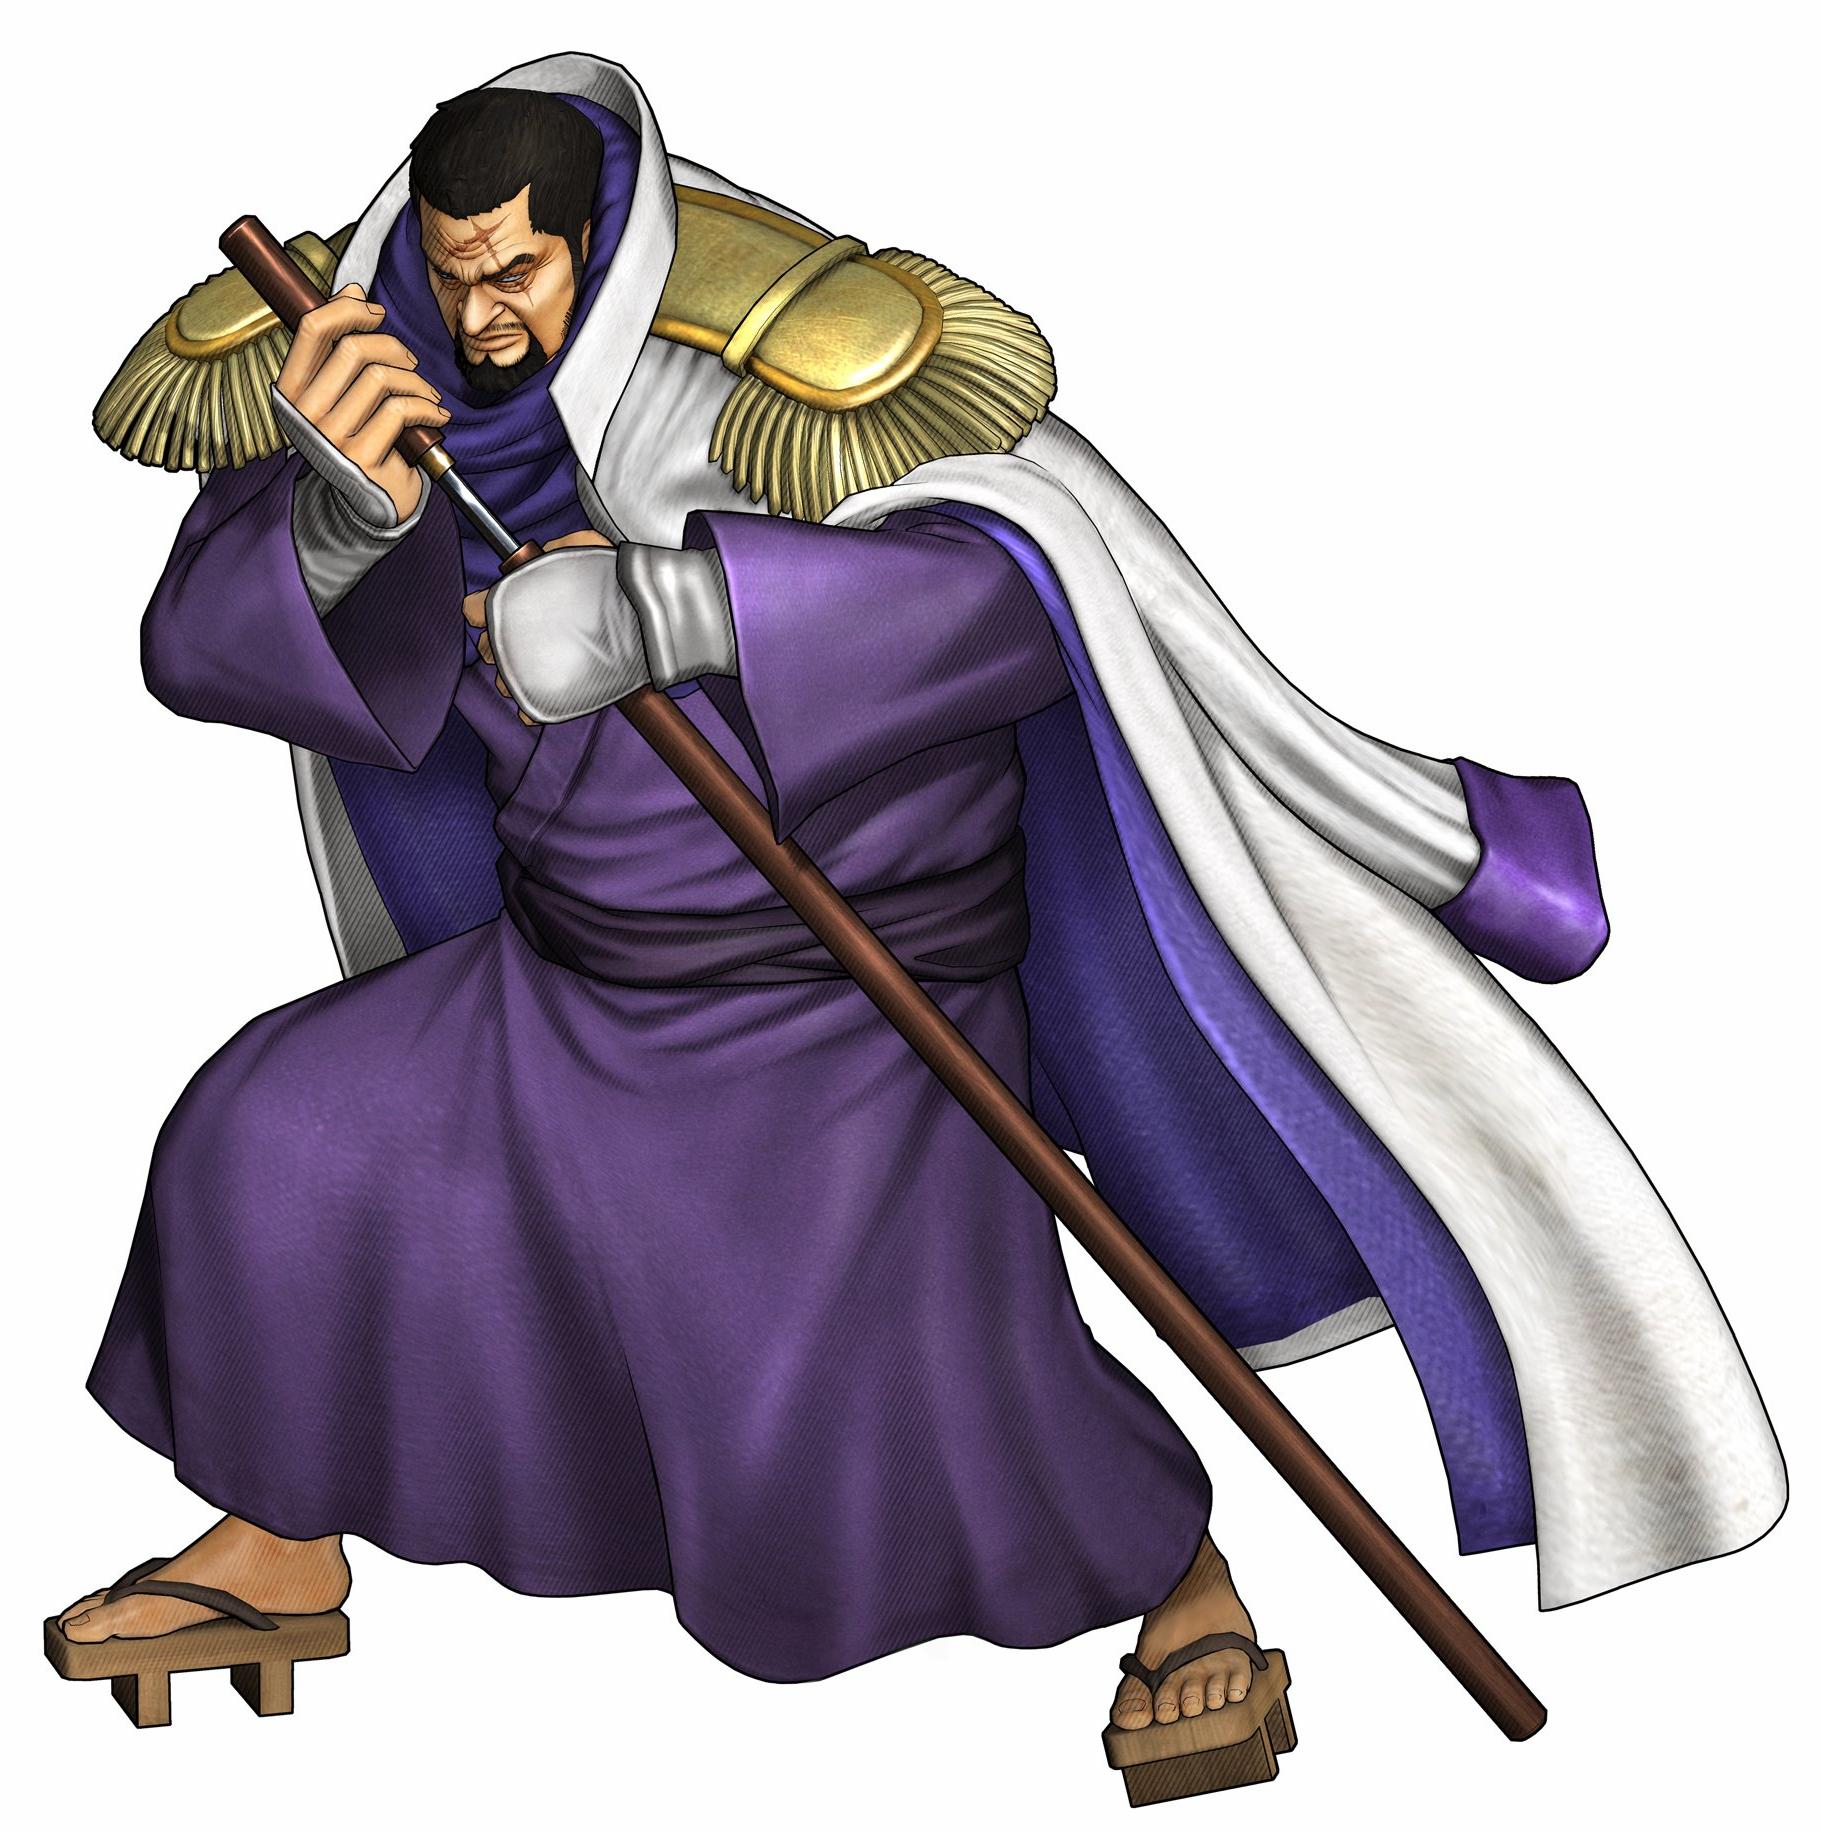 Image - Fujitora Pirate Warriors 3.png | One Piece Wiki ...